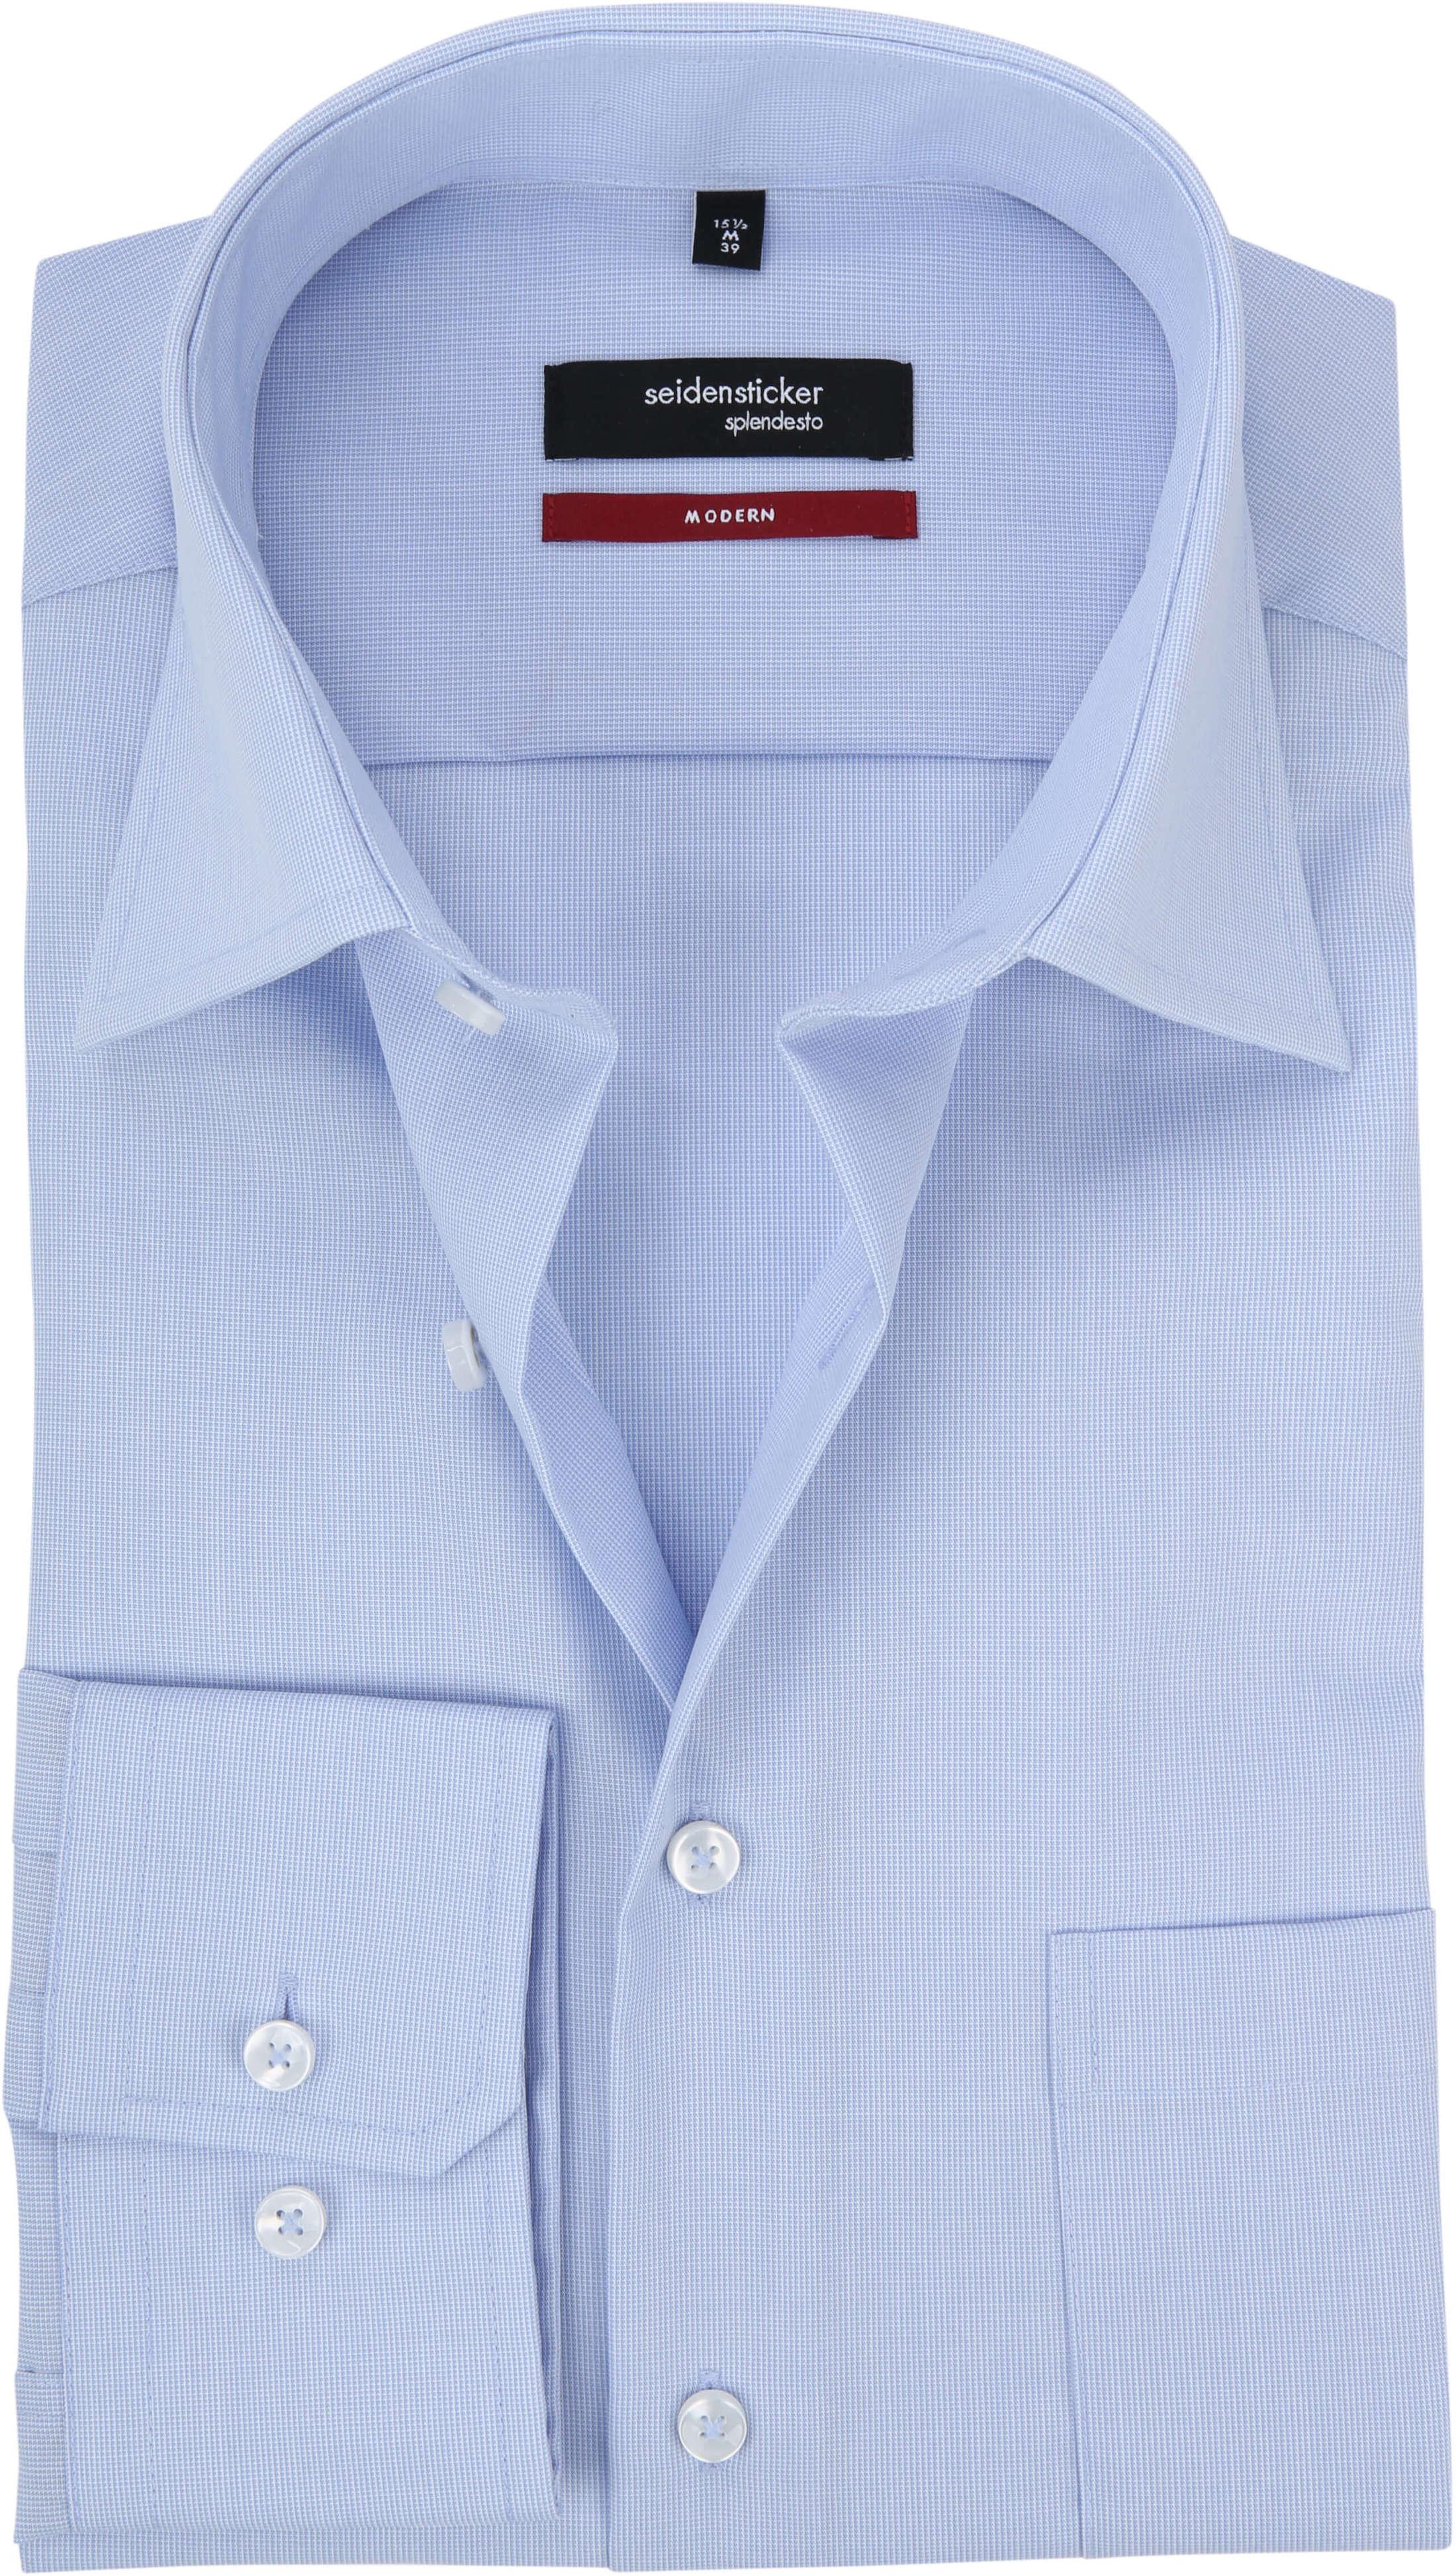 Seidensticker Hemd Modern Bügelfrei Himmelblau foto 0